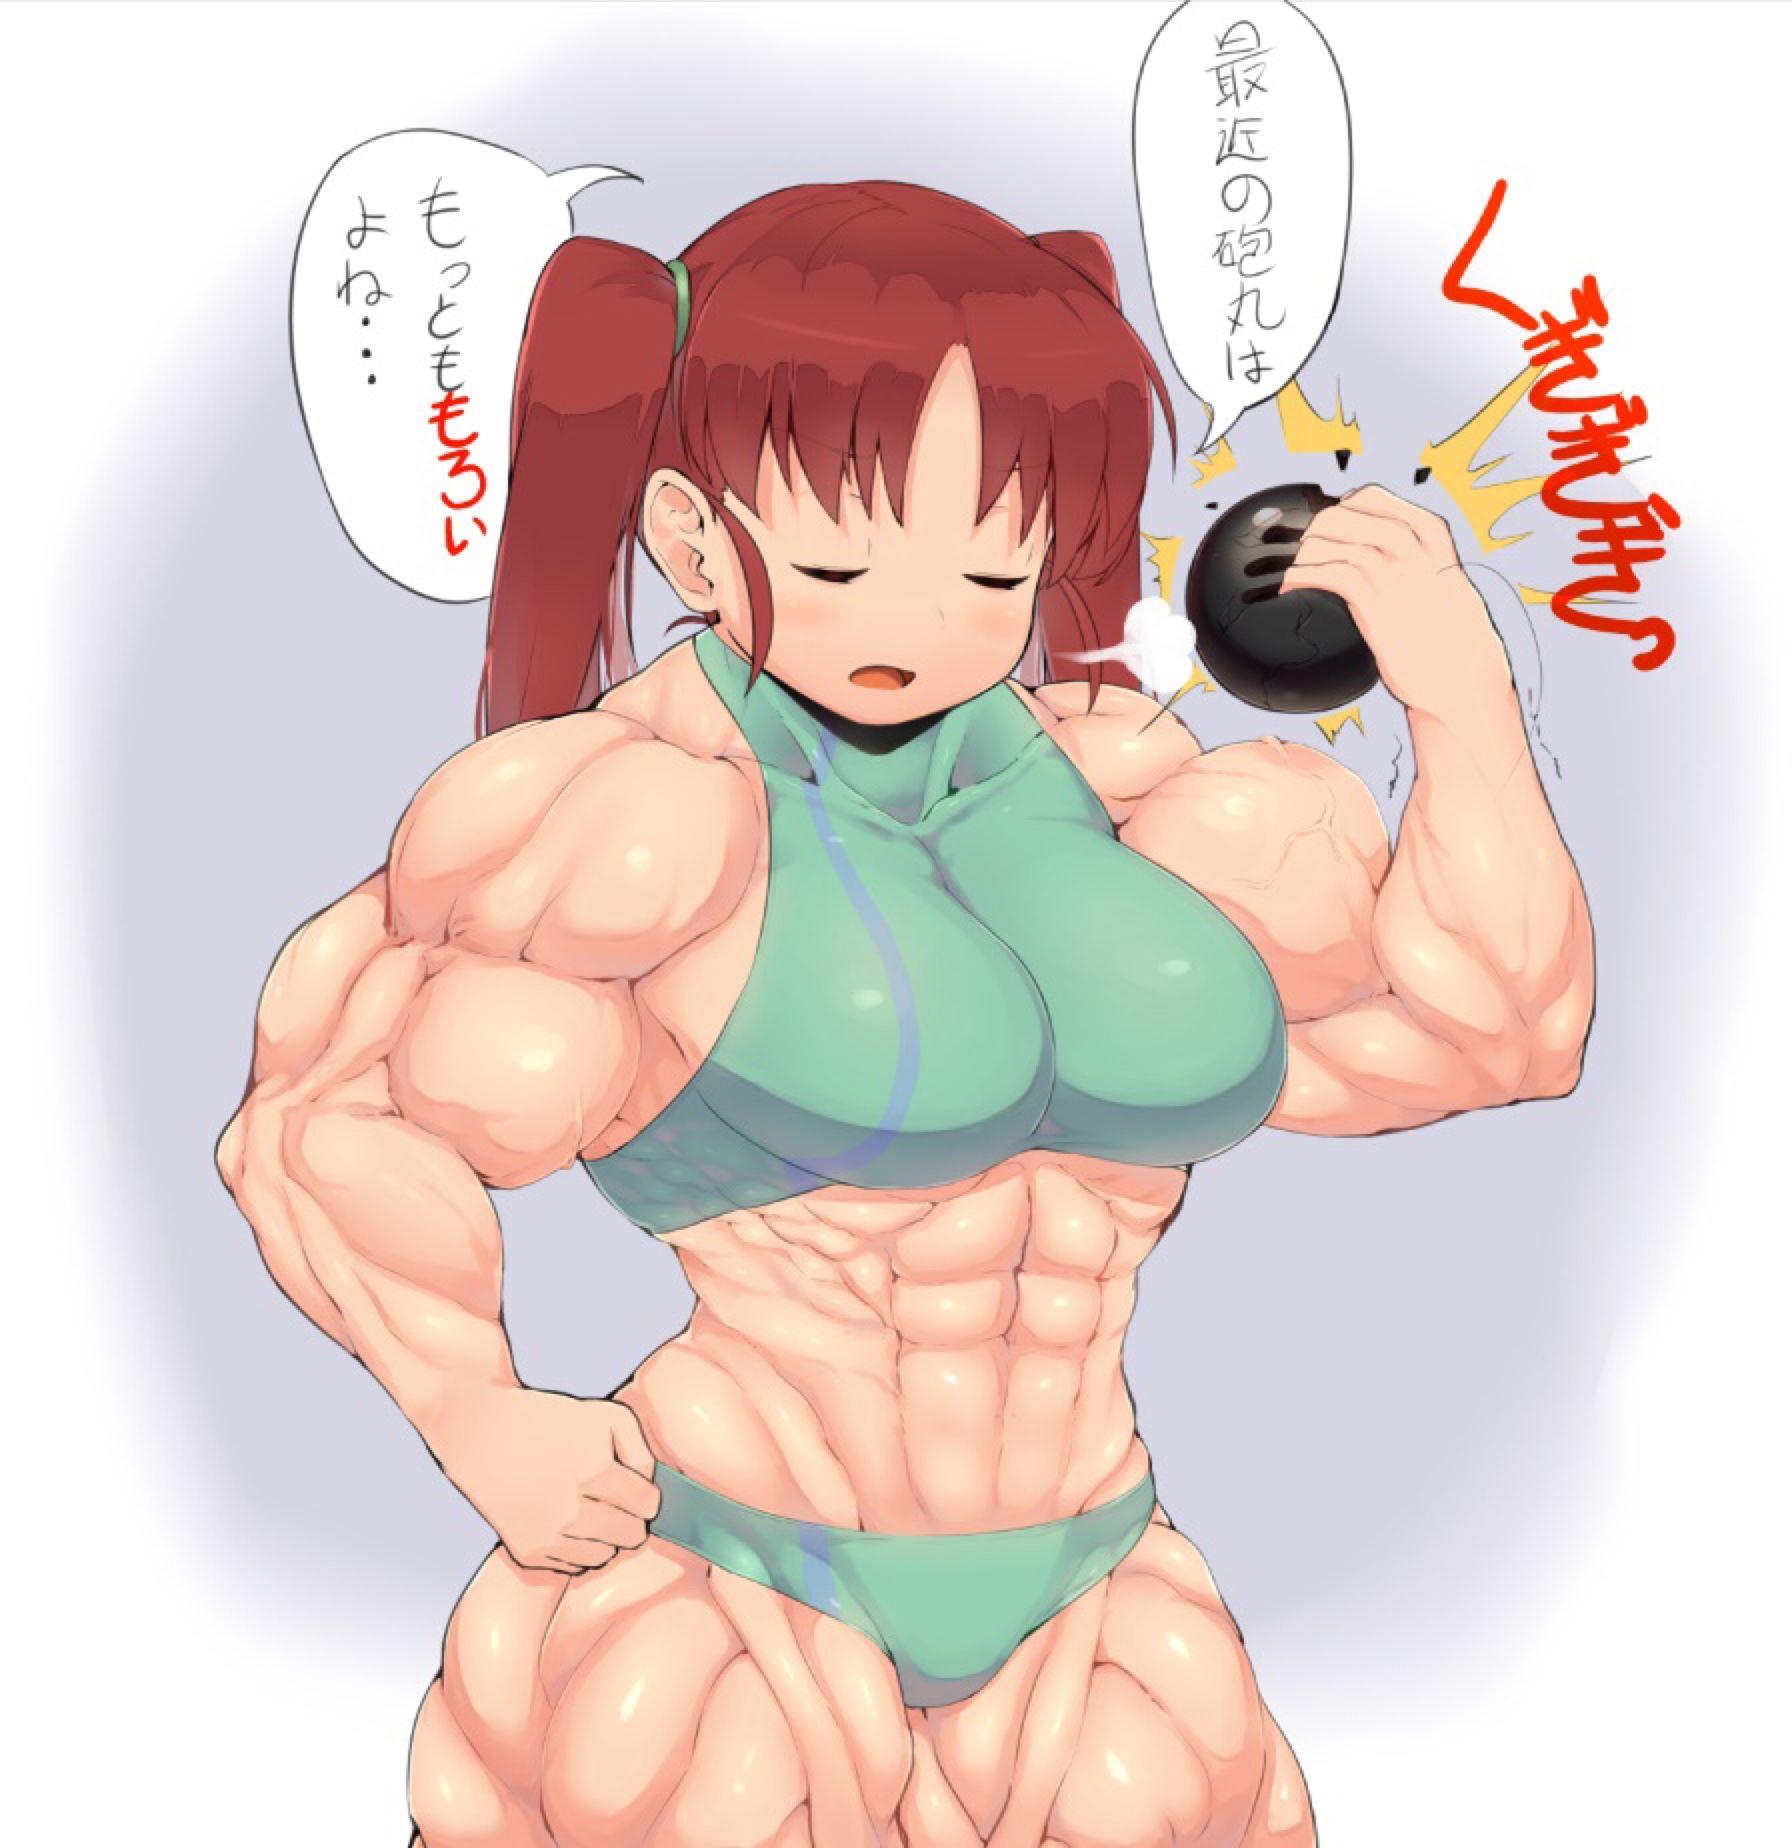 Mayumi By Elee0228 On Deviantart Comic Art Anime Art